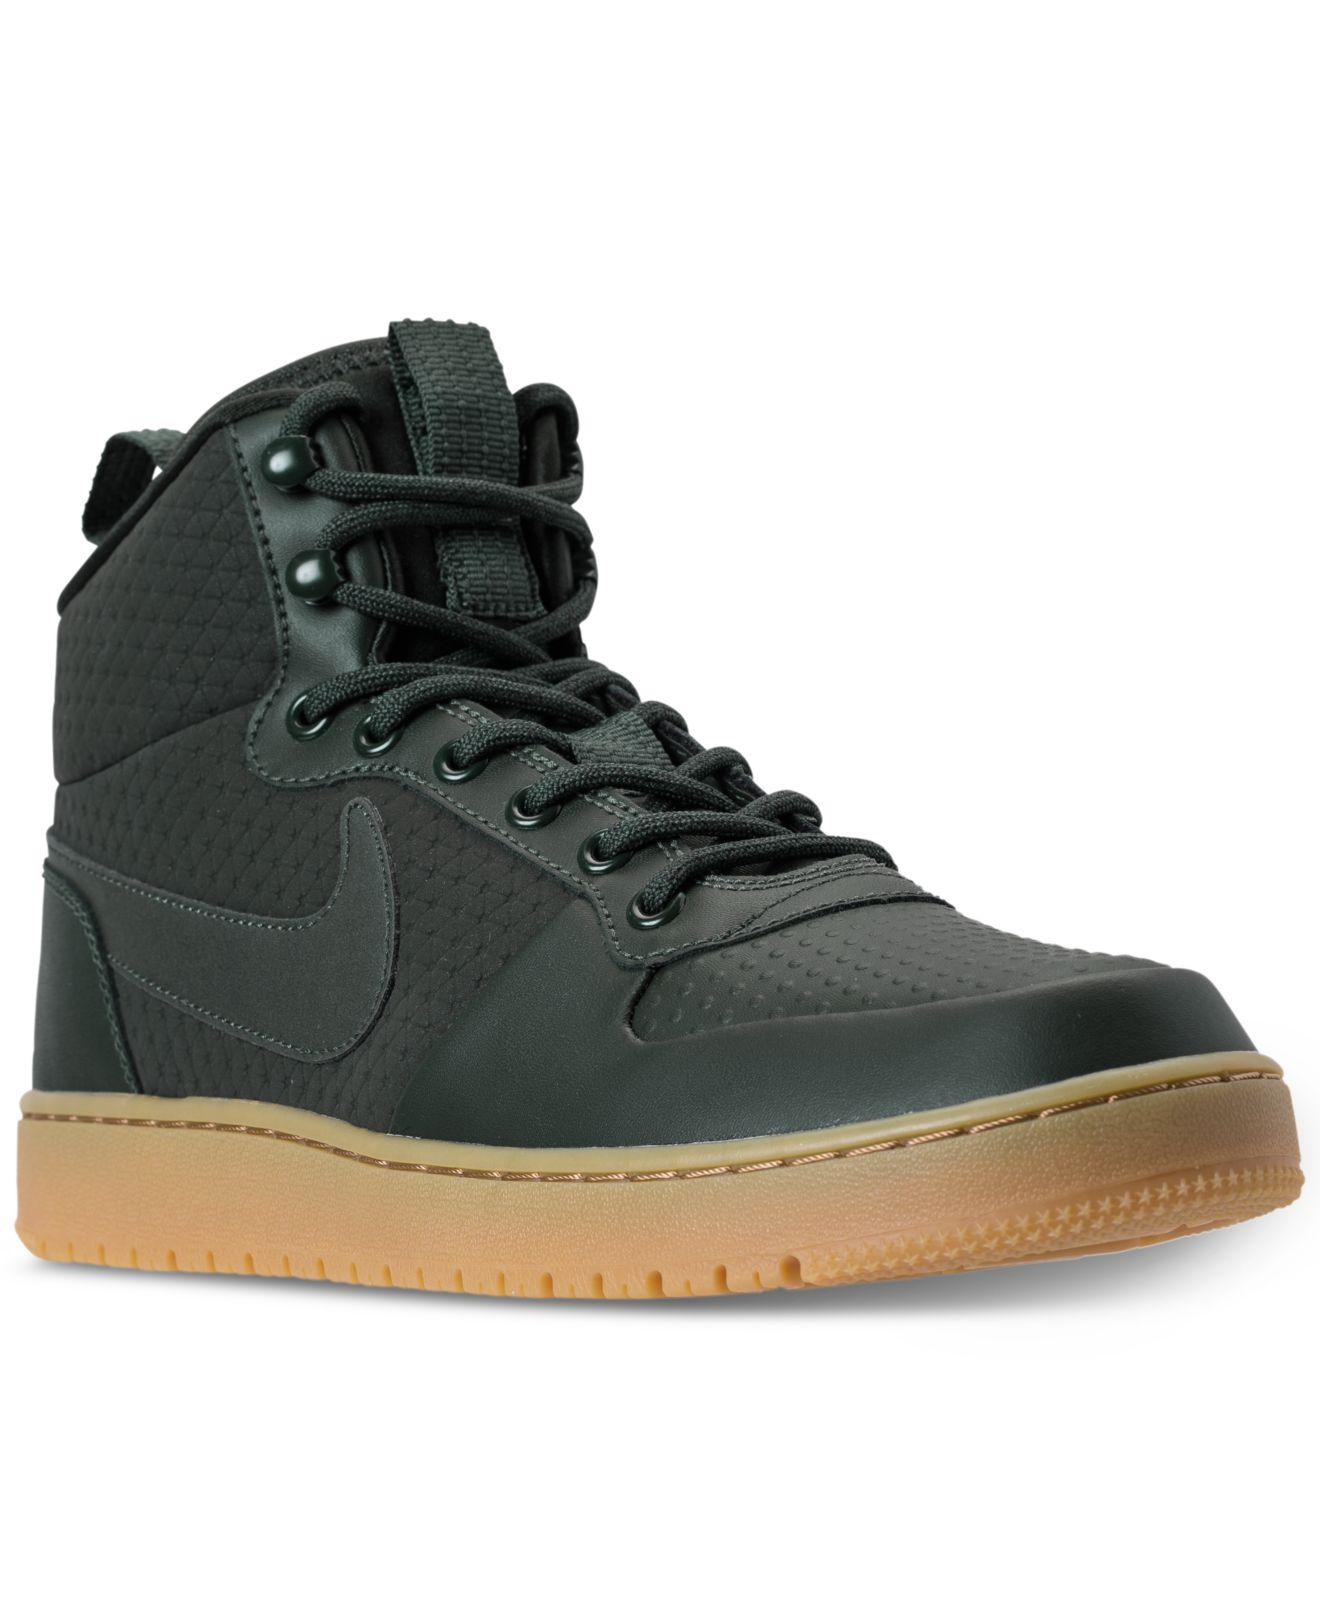 Nike Neoprene Water Shoes